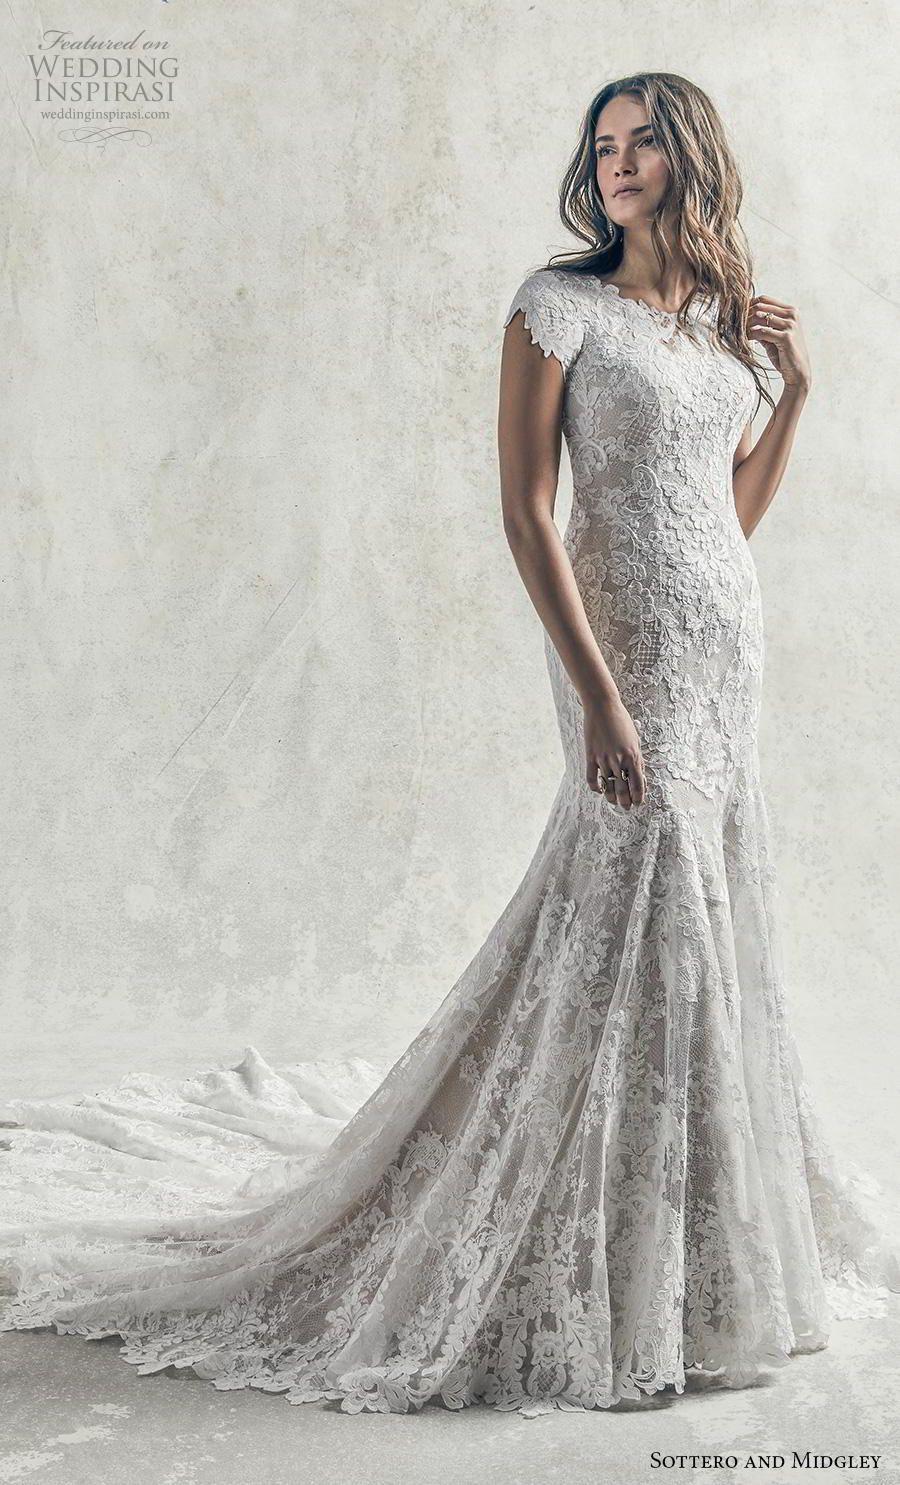 Sottero and midgley spring wedding dresses u ucbardotud bridal